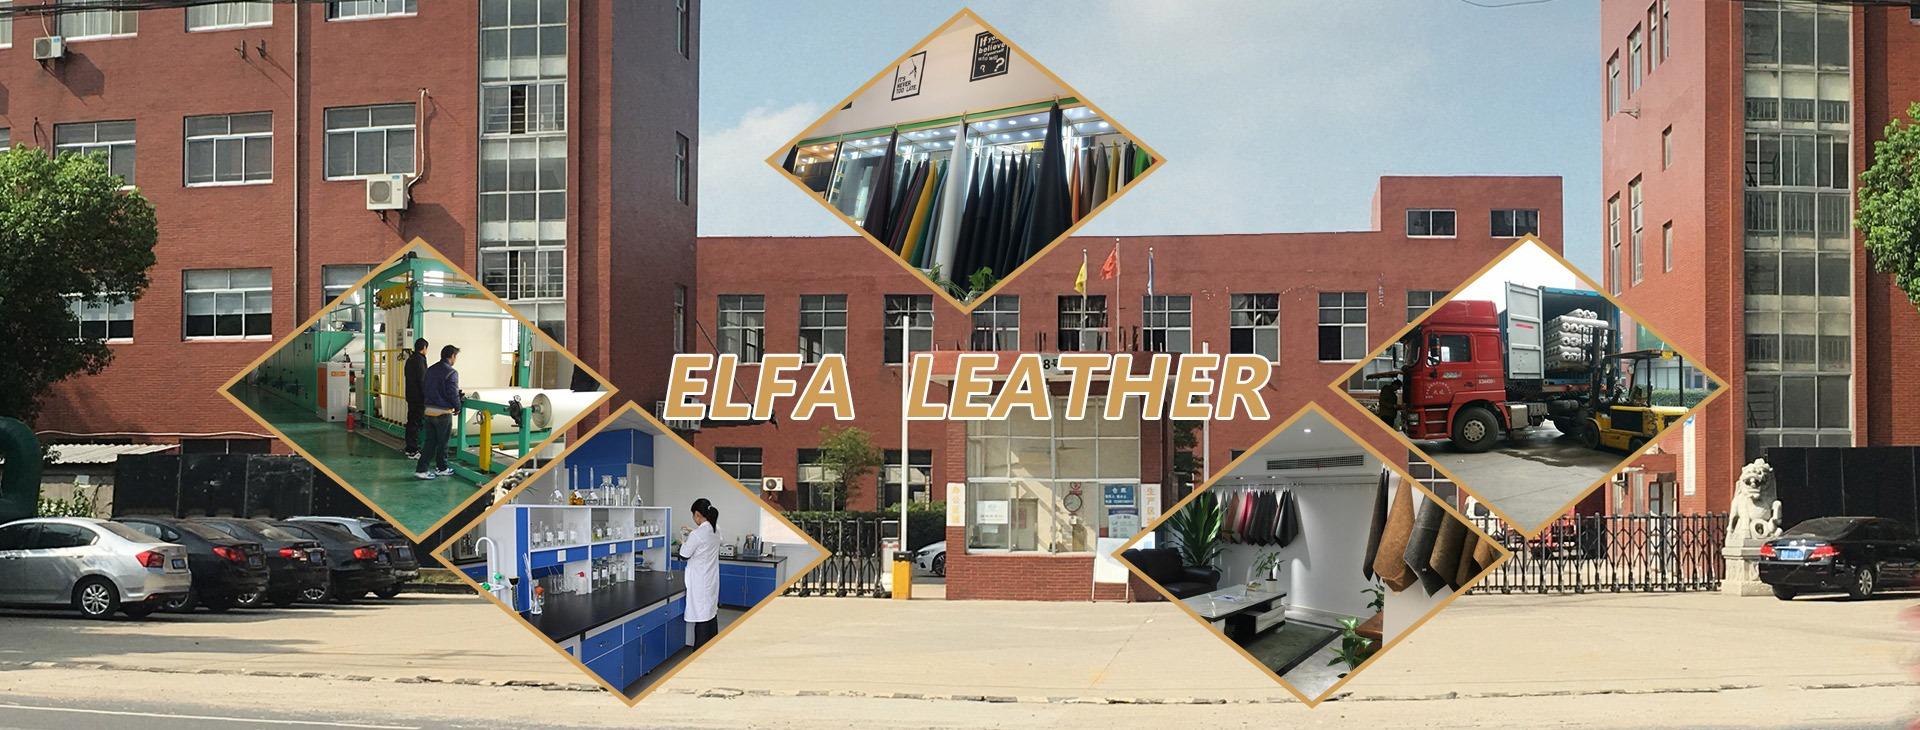 elfa leather enterprise